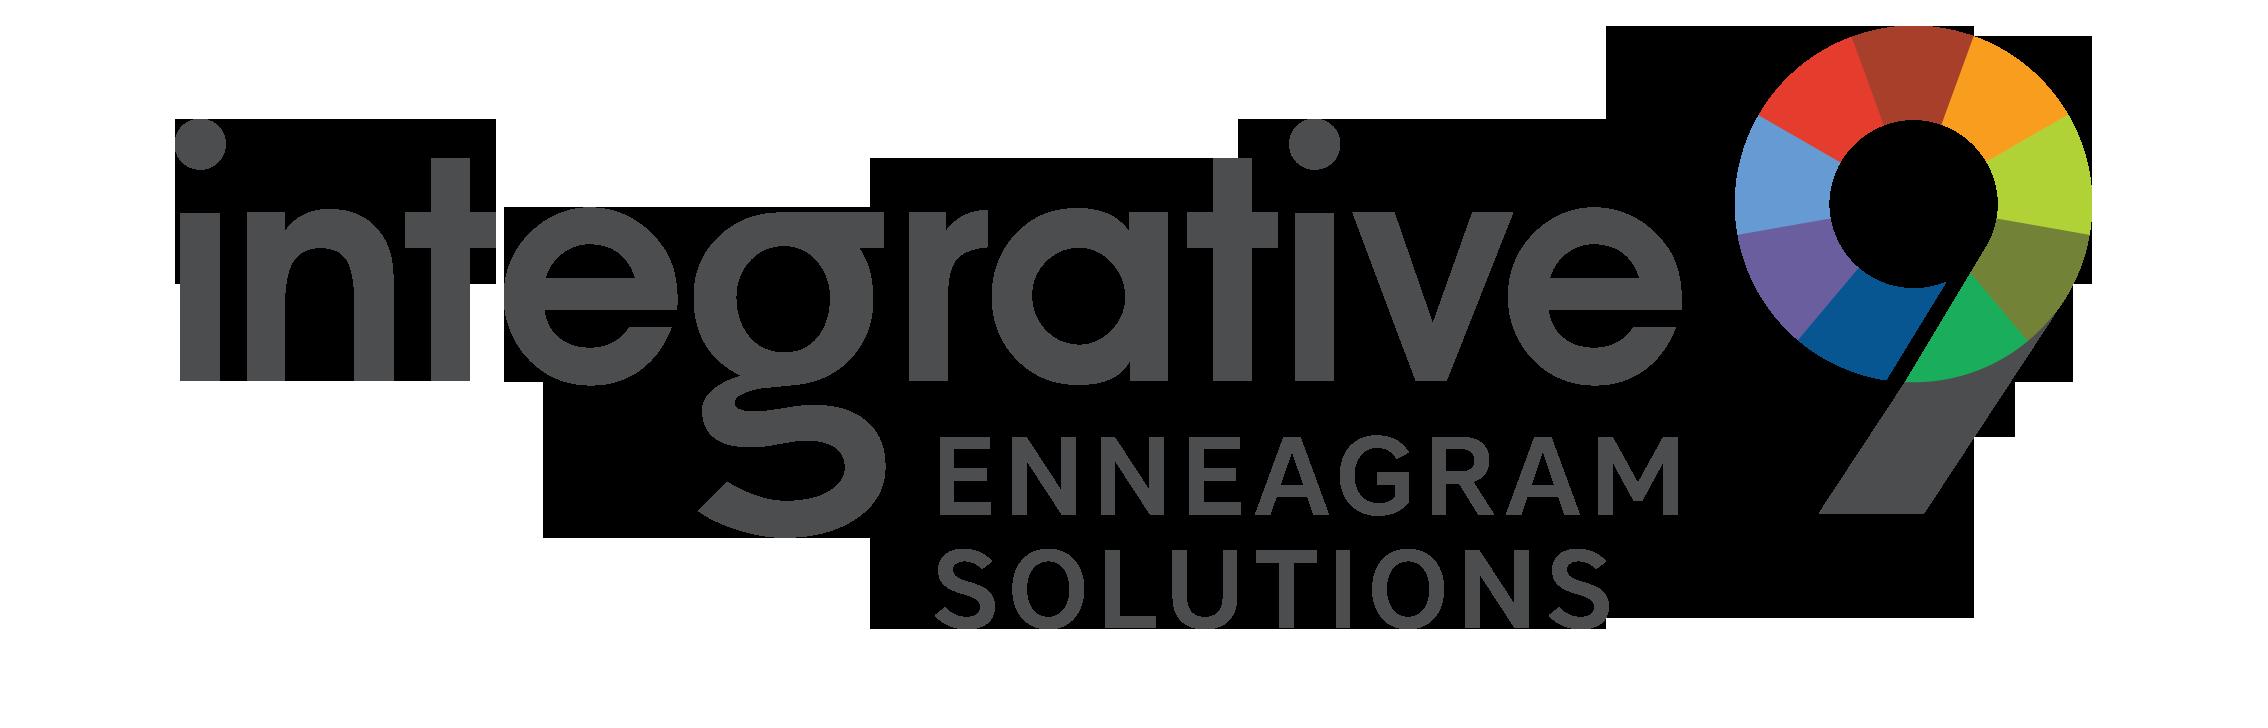 Integrative9